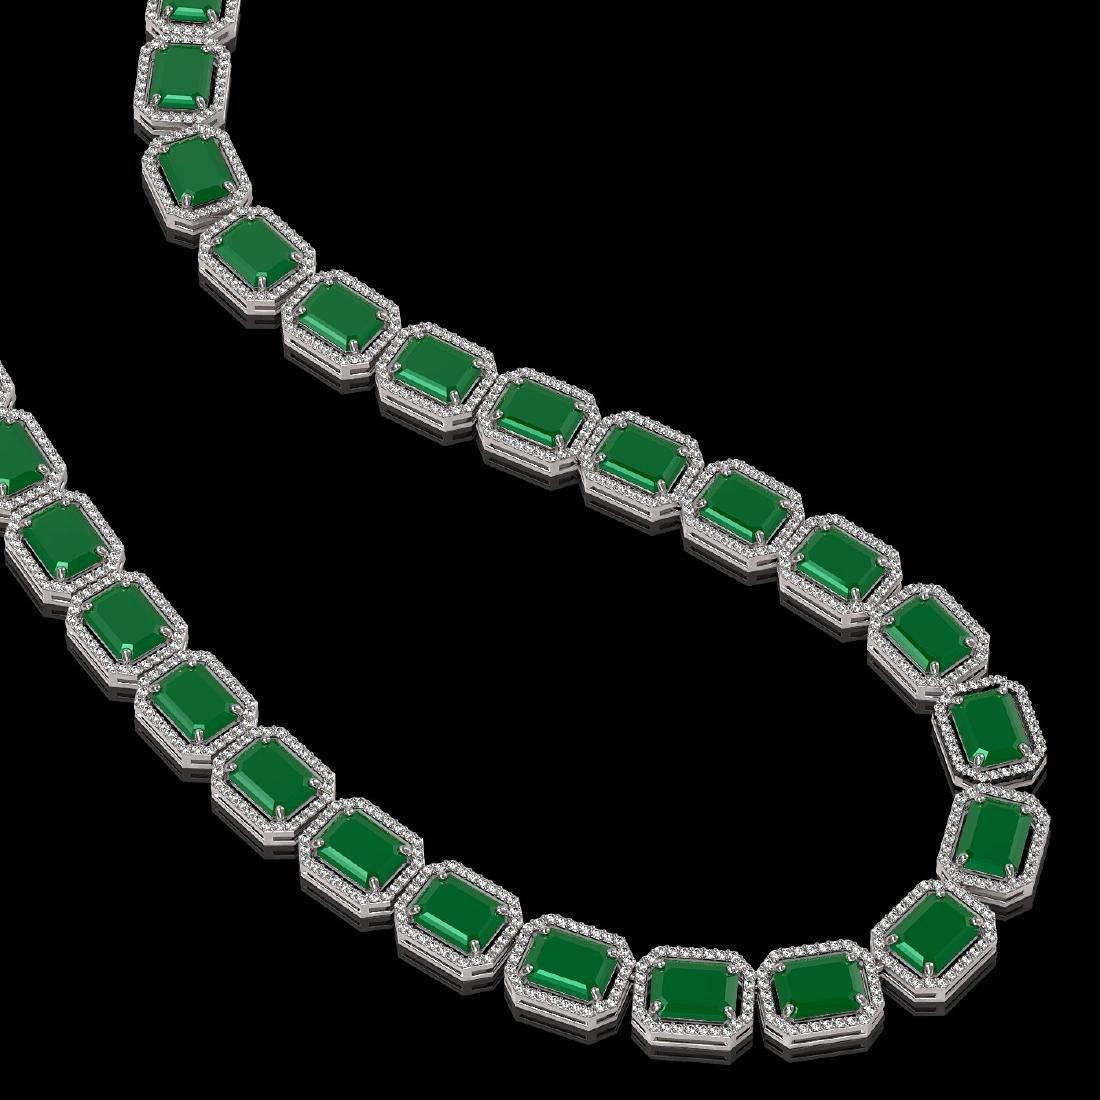 84.94 CTW Emerald & Diamond Halo Necklace 10K White - 2